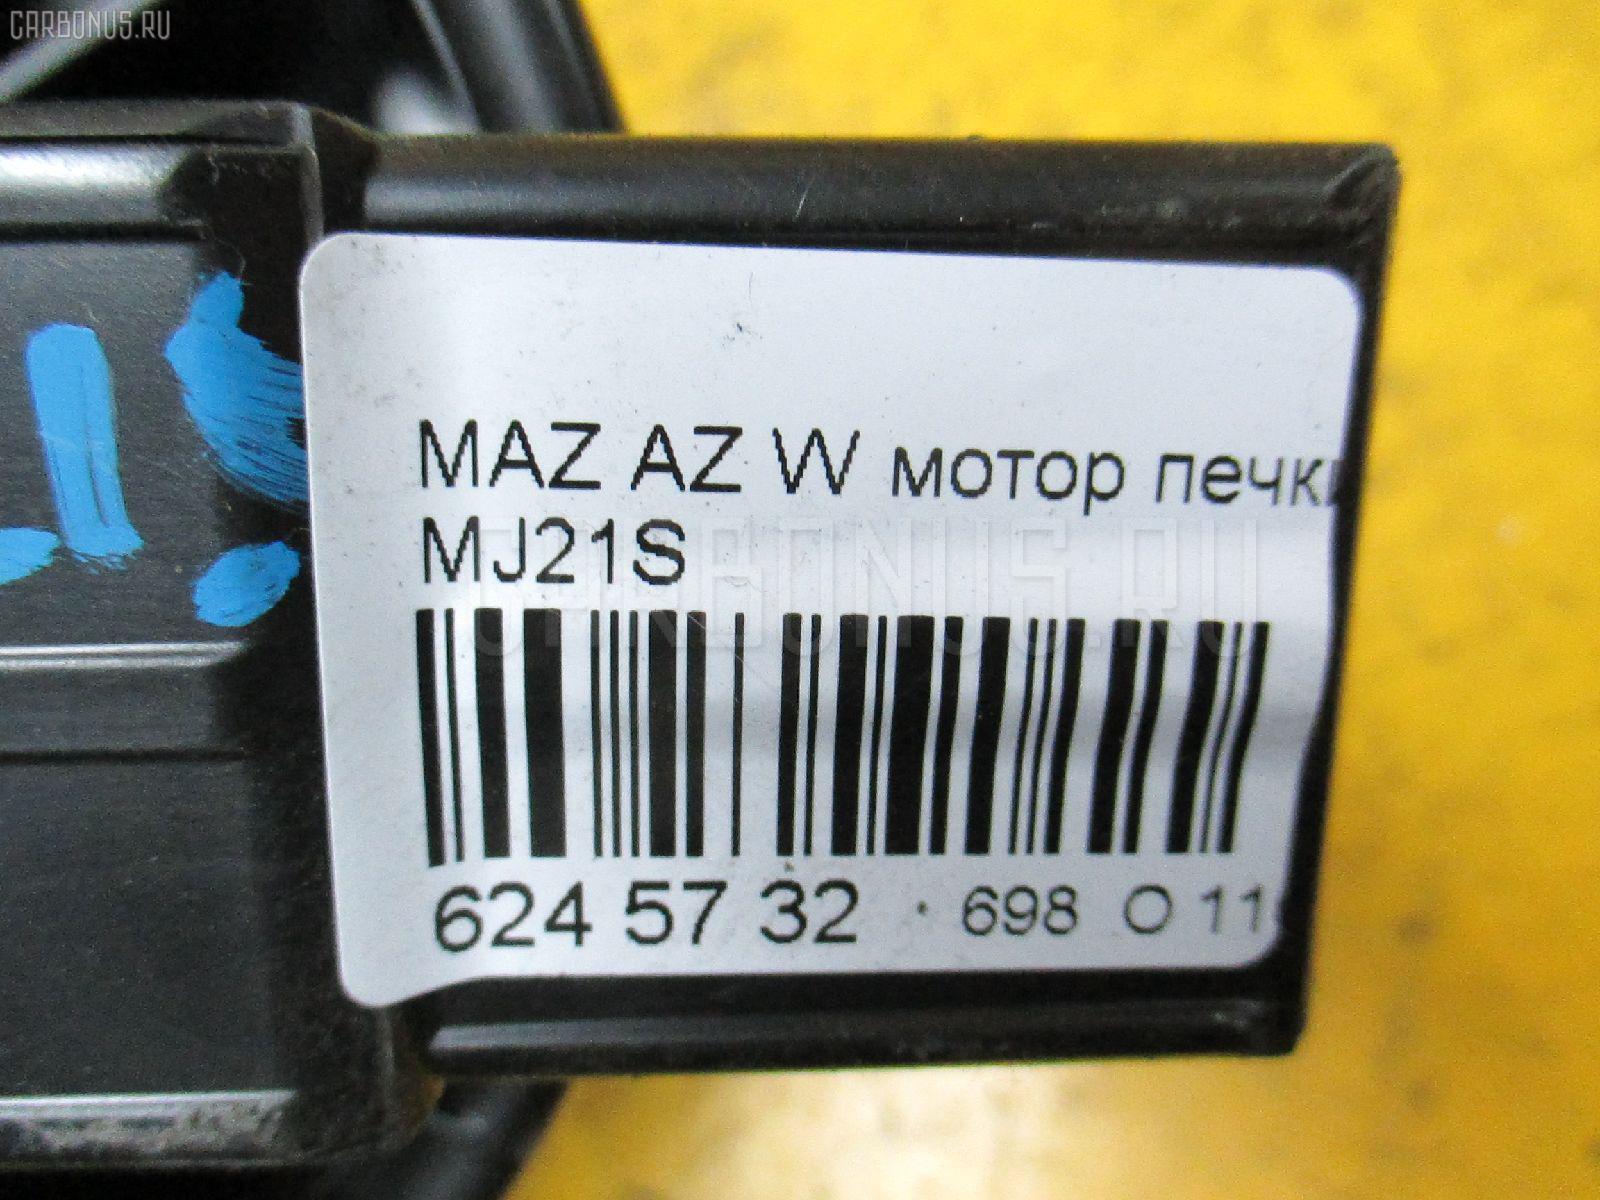 Мотор печки MAZDA AZ WAGON MJ21S Фото 3